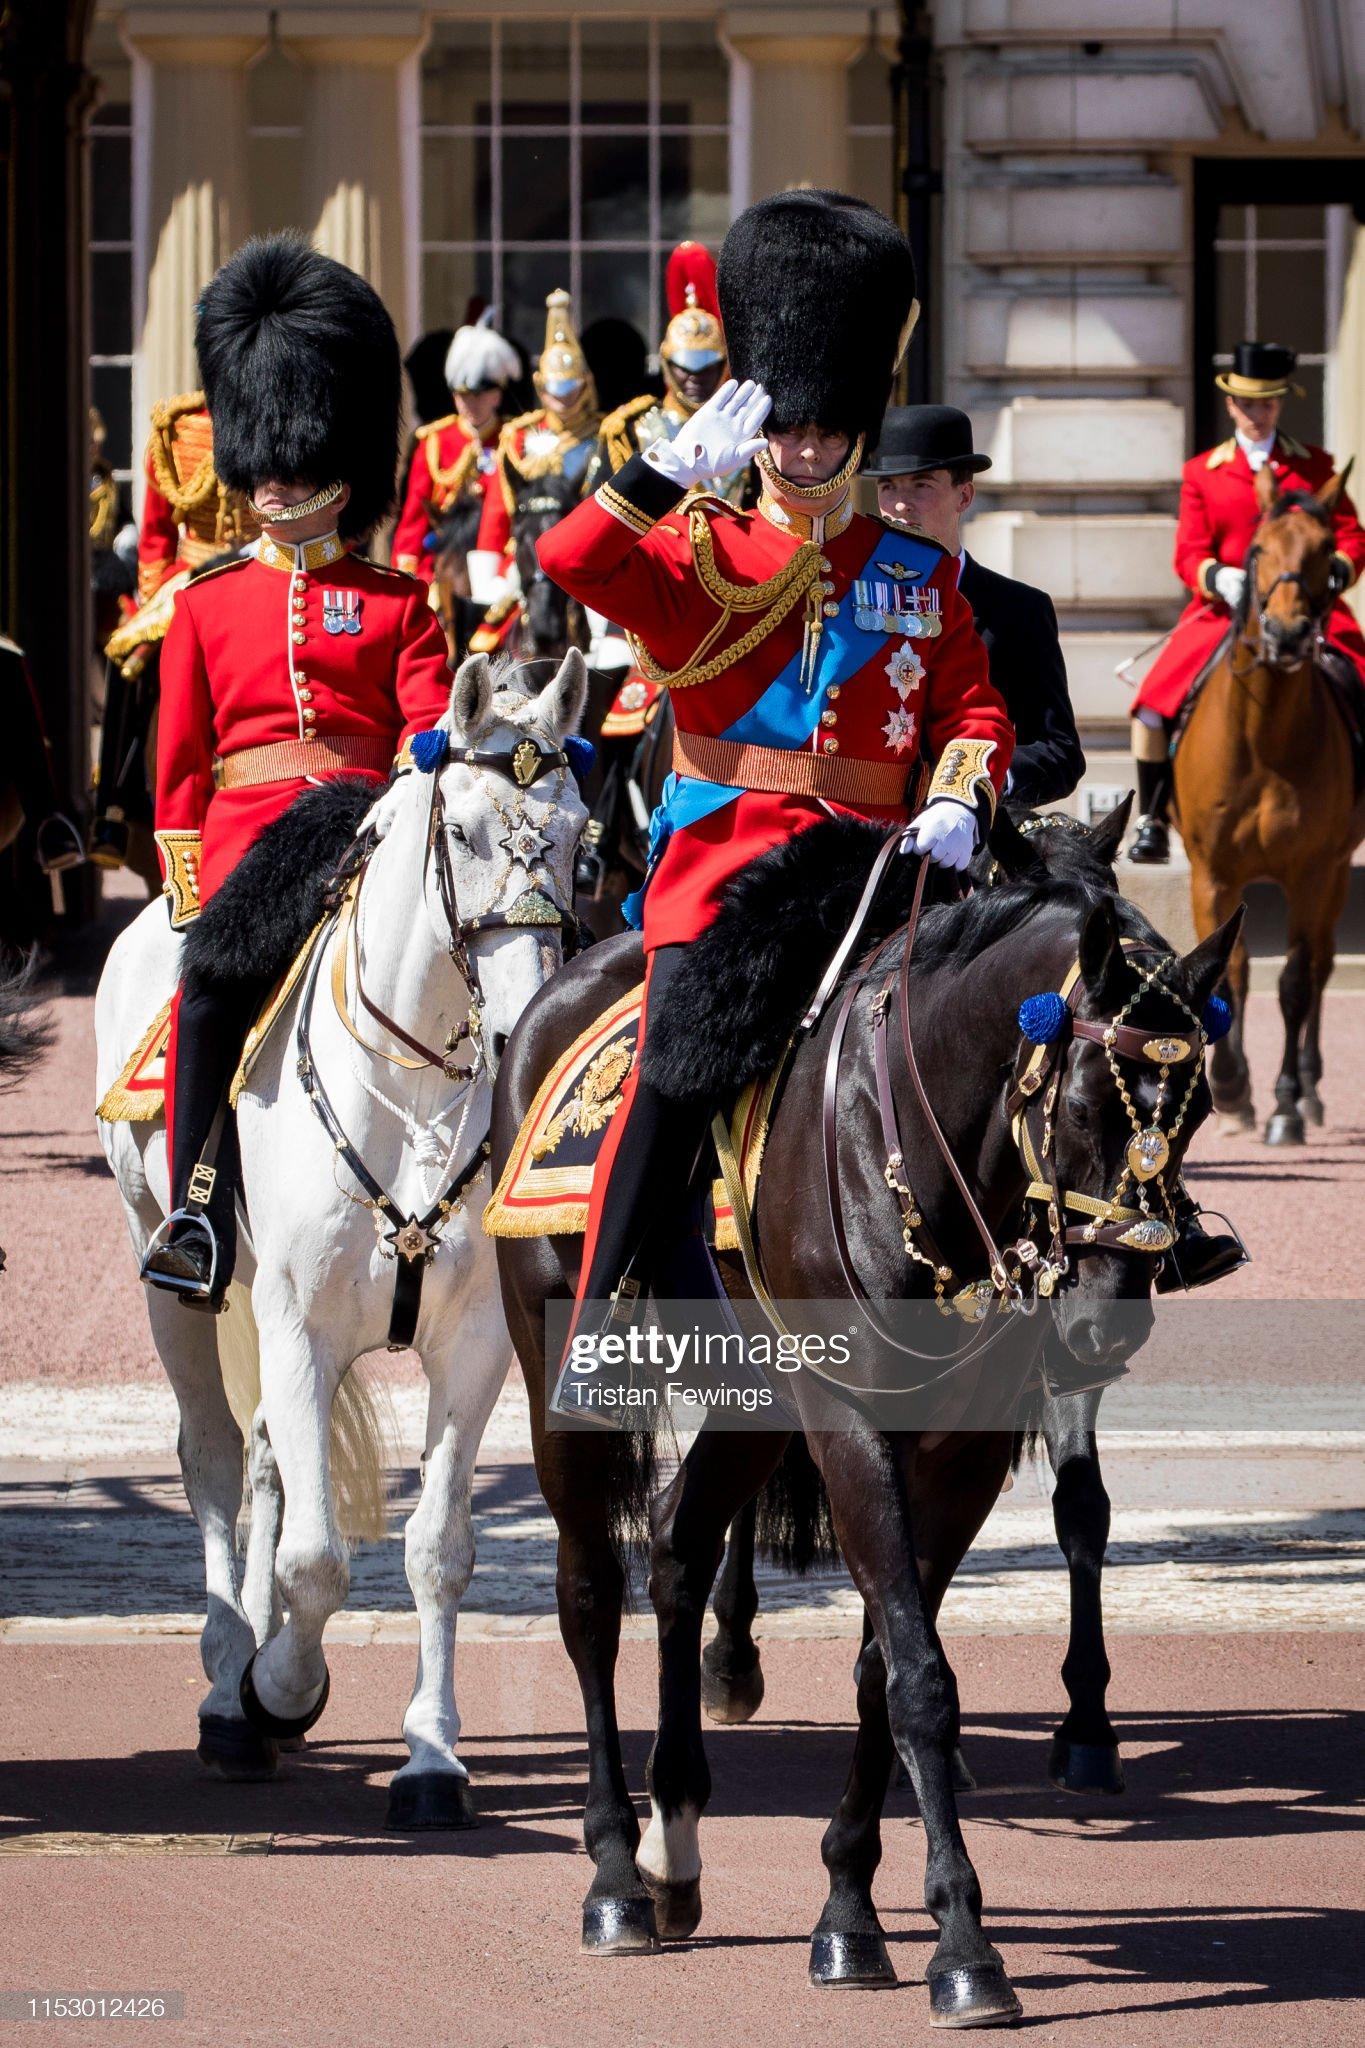 Герцог Йоркский с семьёй и на коне